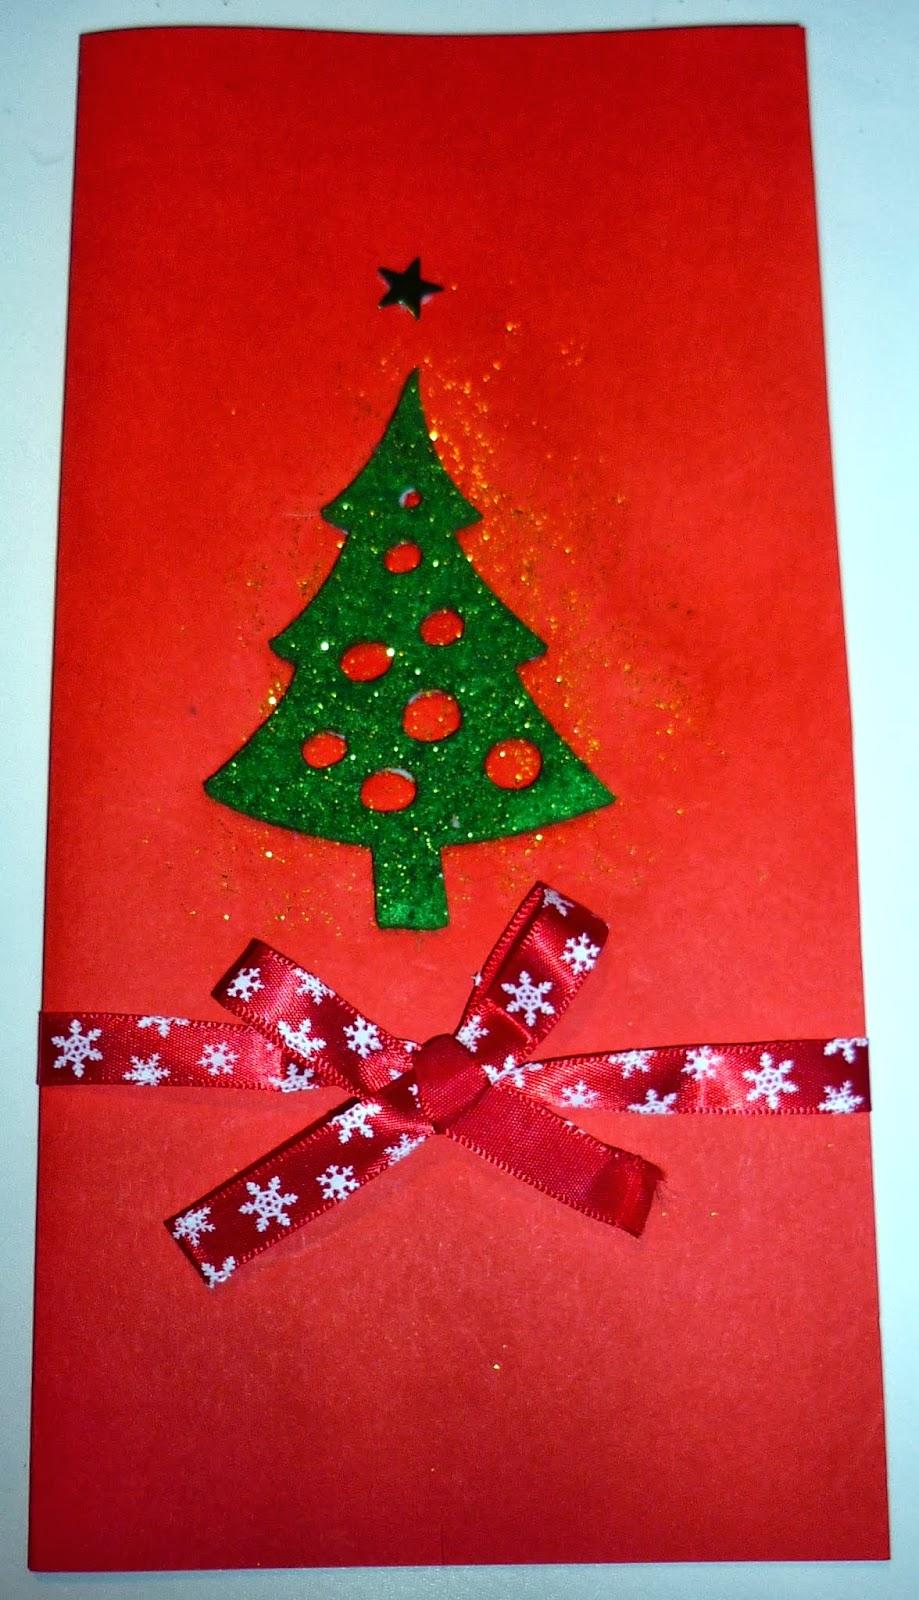 Hacer Tarjetas De Navidad Hacer Tarjetas De Navidad Nuevas Y - Como-se-hace-una-tarjeta-de-navidad